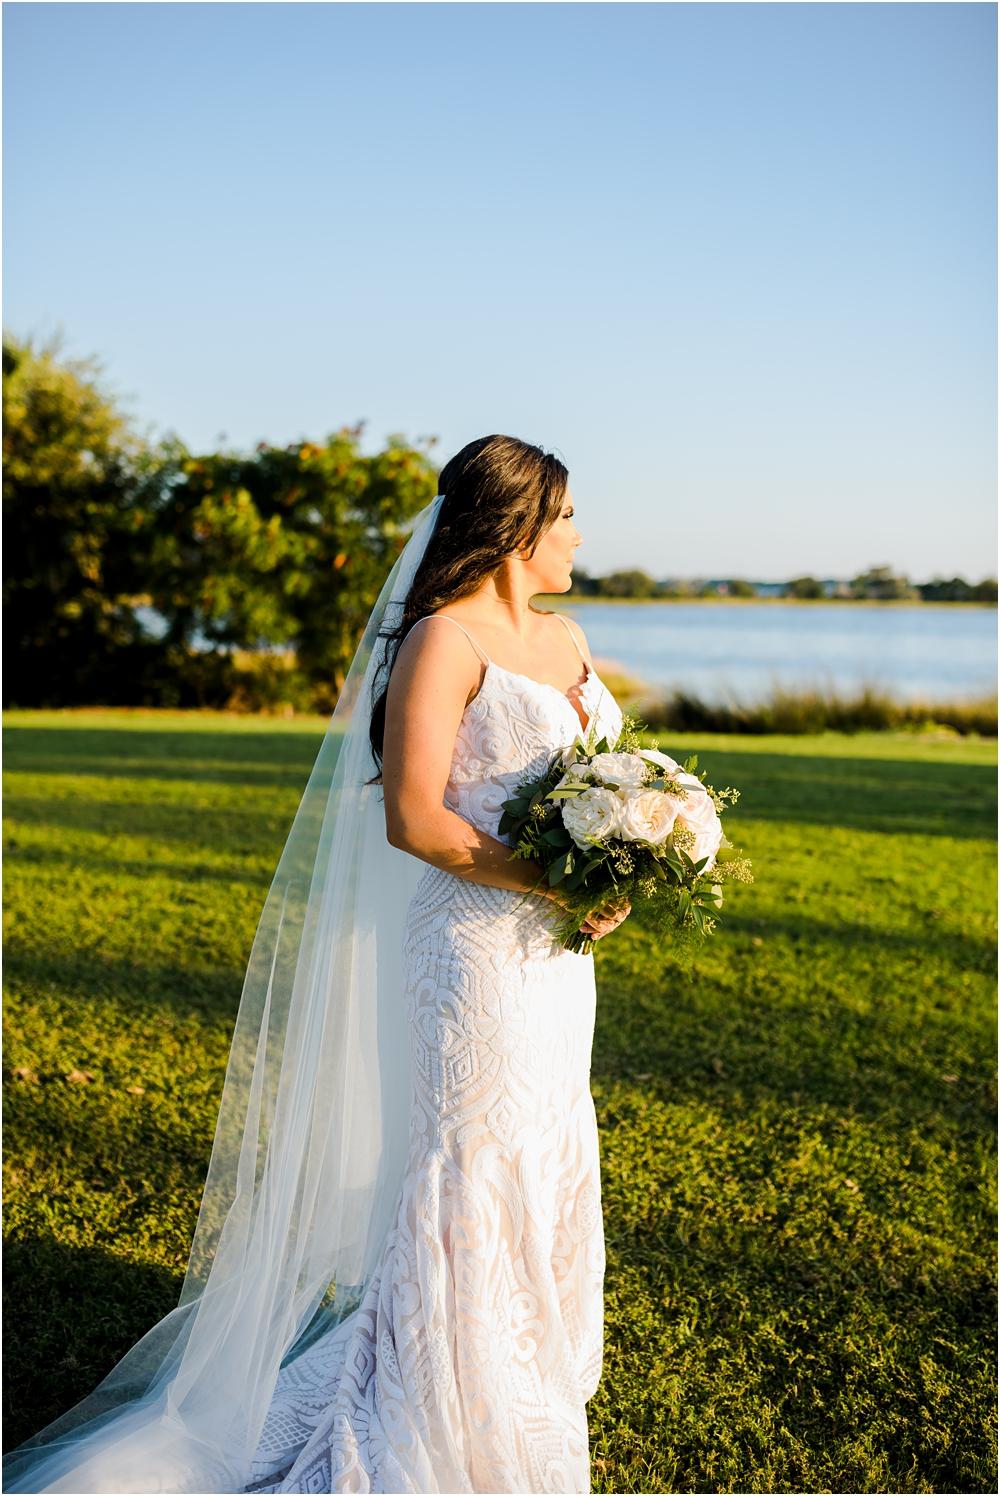 amack-wedding-kiersten-stevenson-photography-30a-panama-city-beach-dothan-tallahassee-(430-of-882).JPG